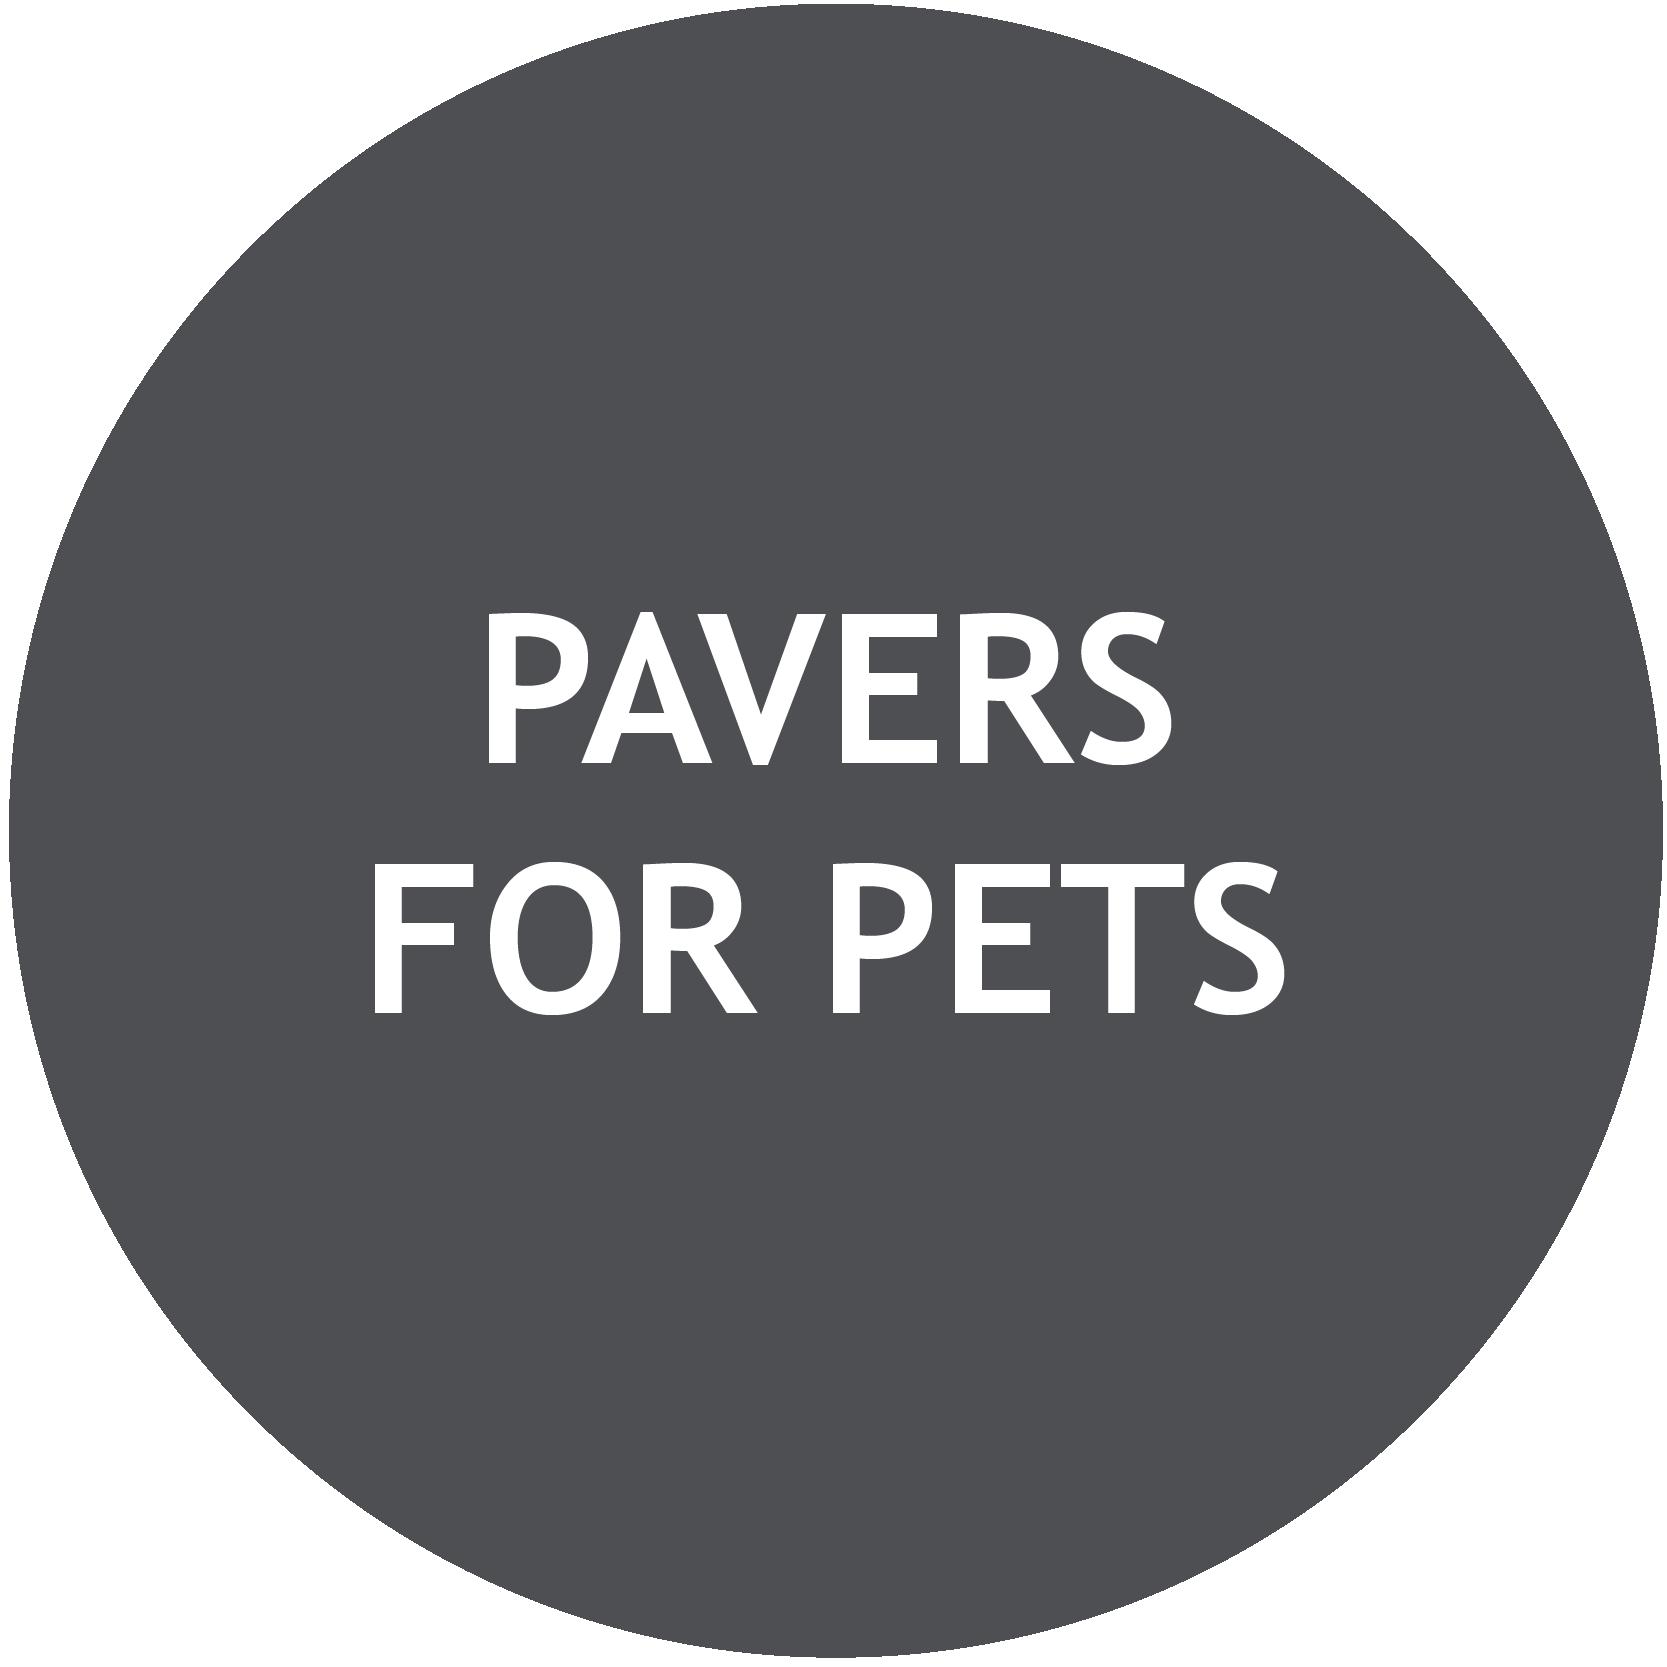 Pavers-Pets-Circle-01.png